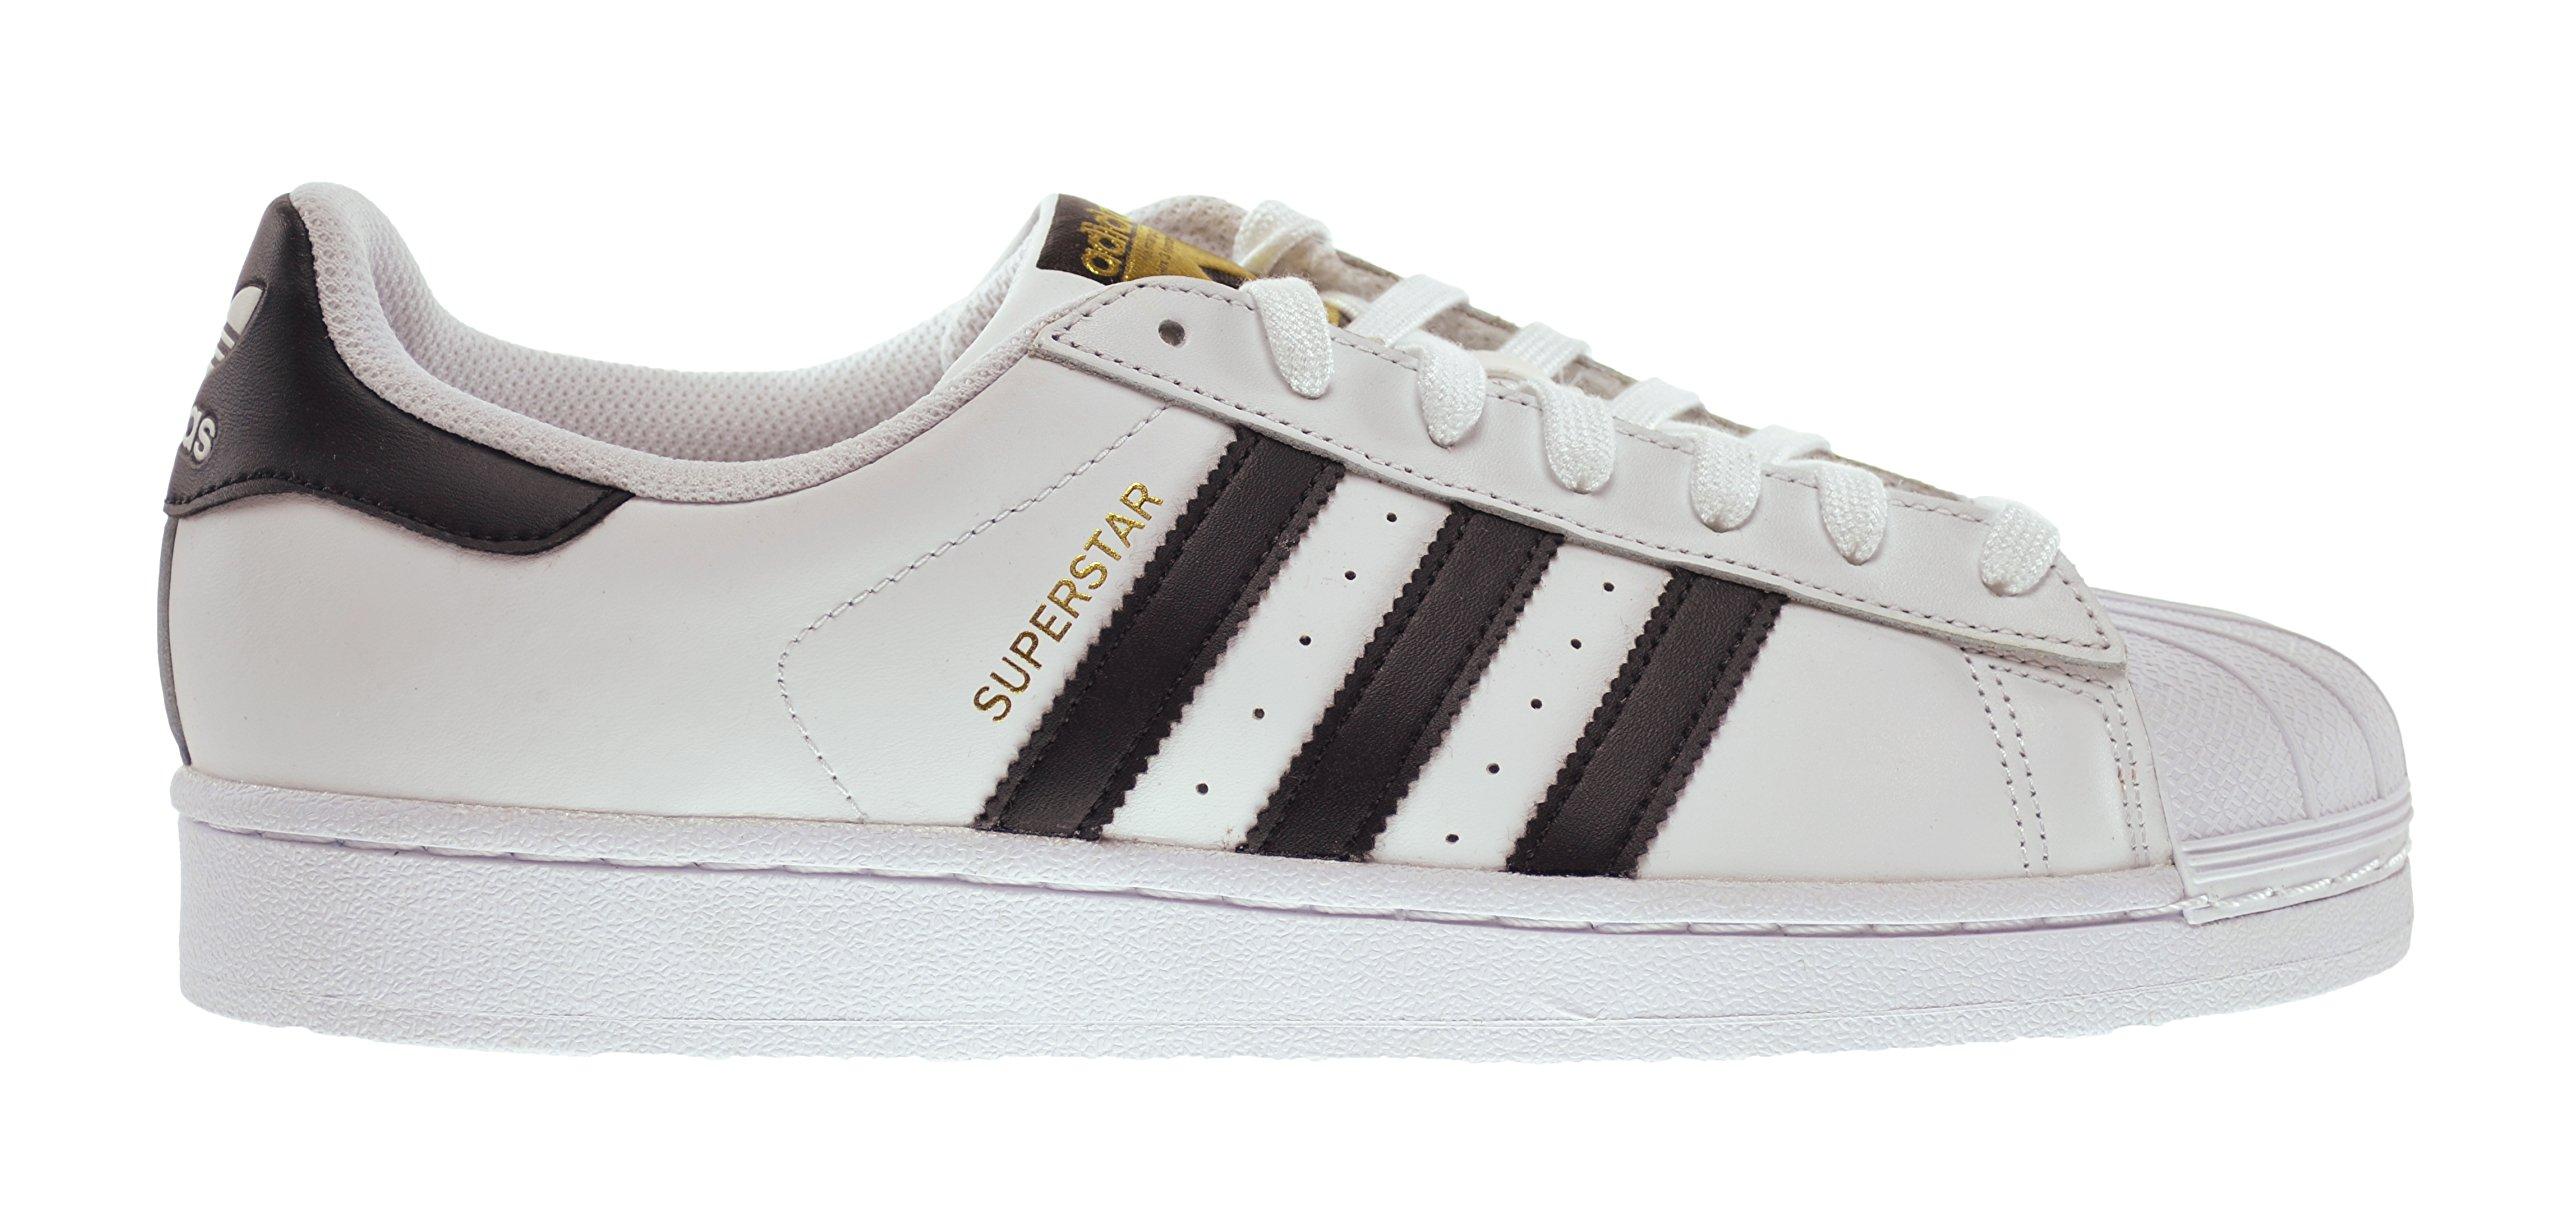 adidas Superstar Men's Shoes Running White FTW/Core Black c77124 (9.5 D(M) US)